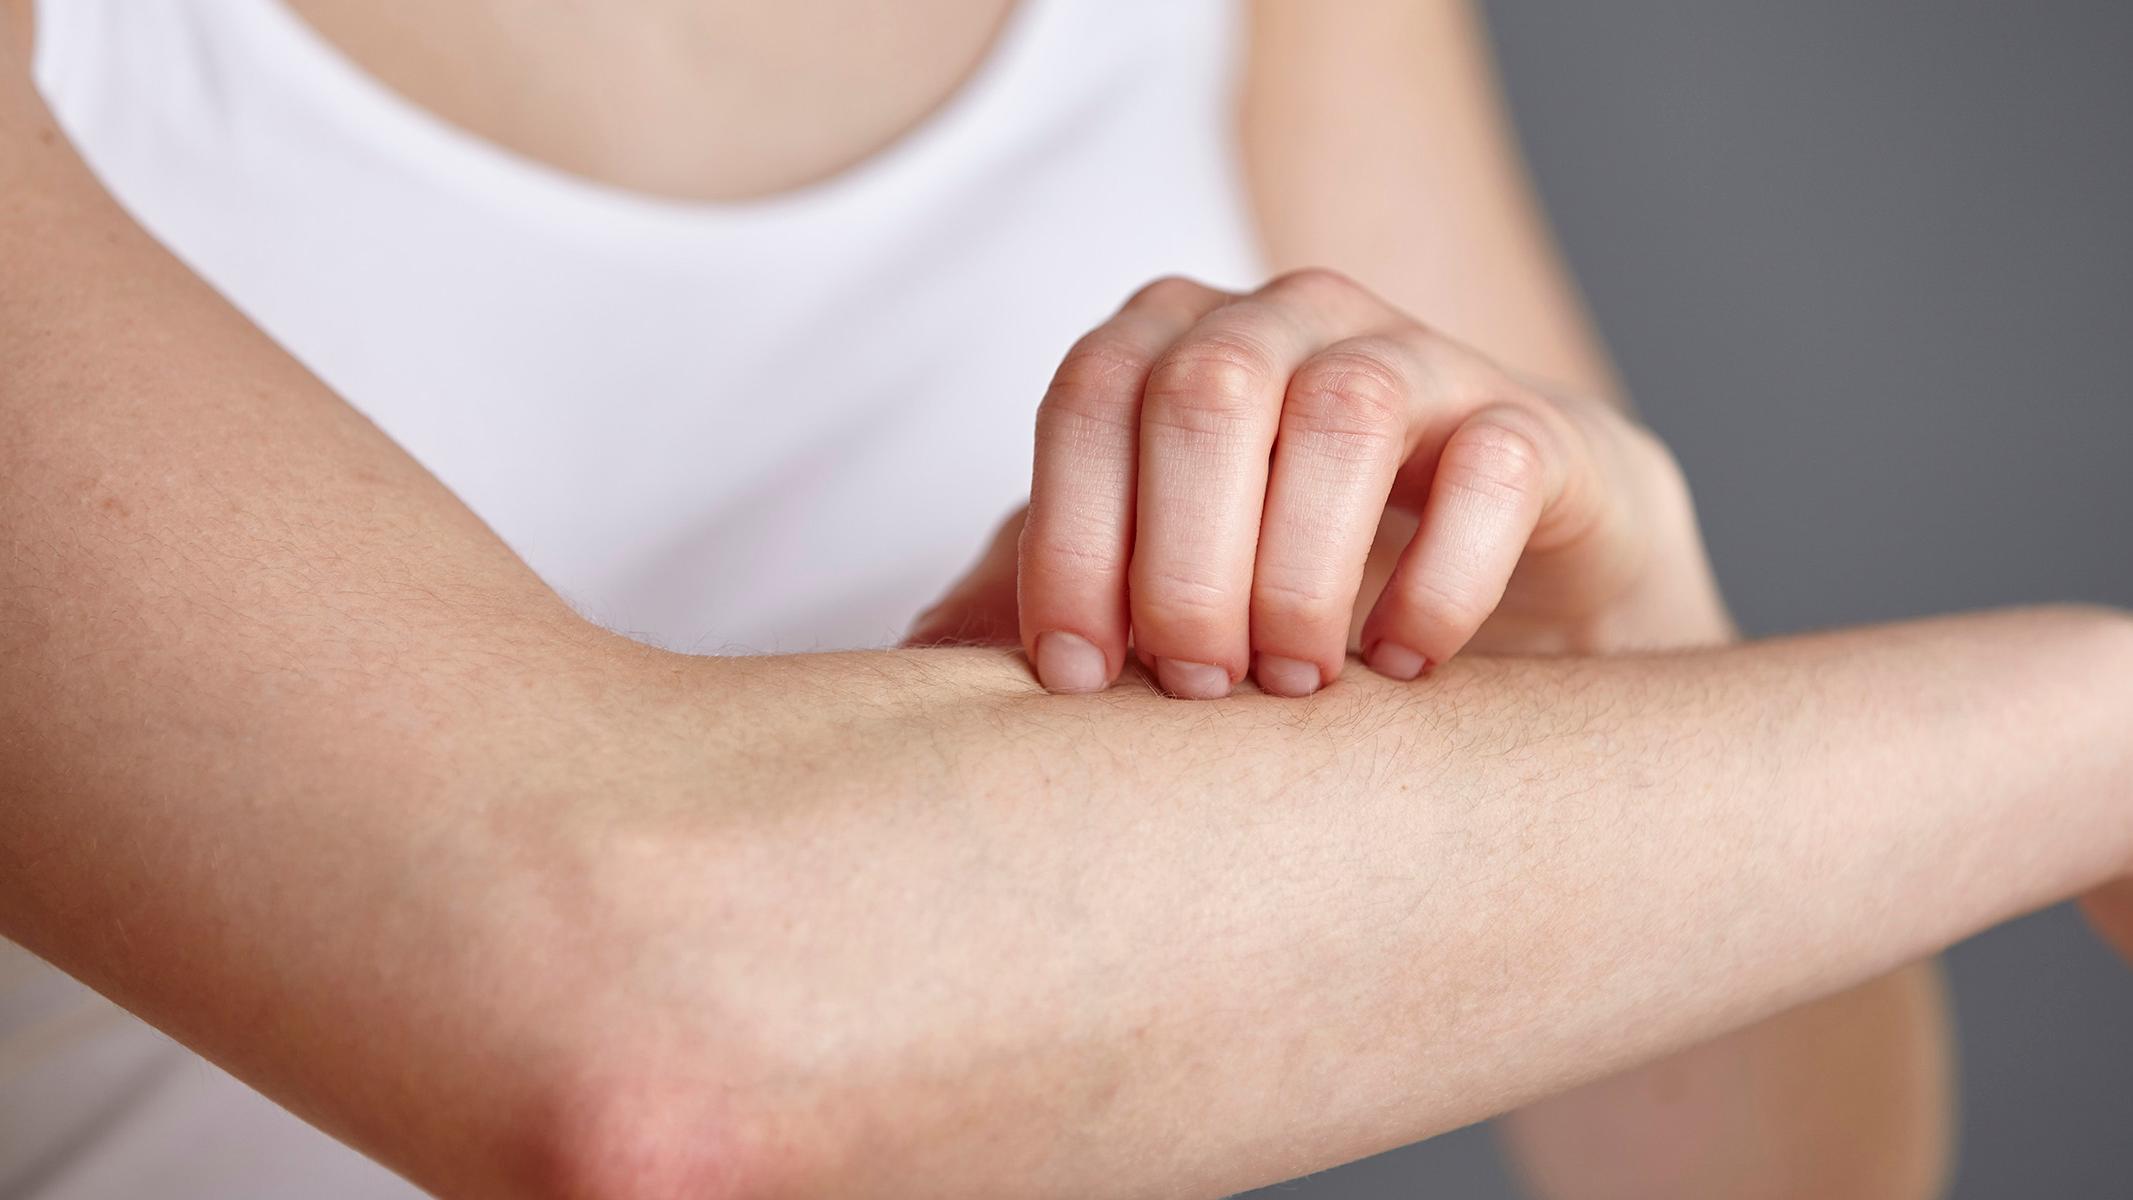 78-123833-contact-dermatitis-causes-symptoms-2